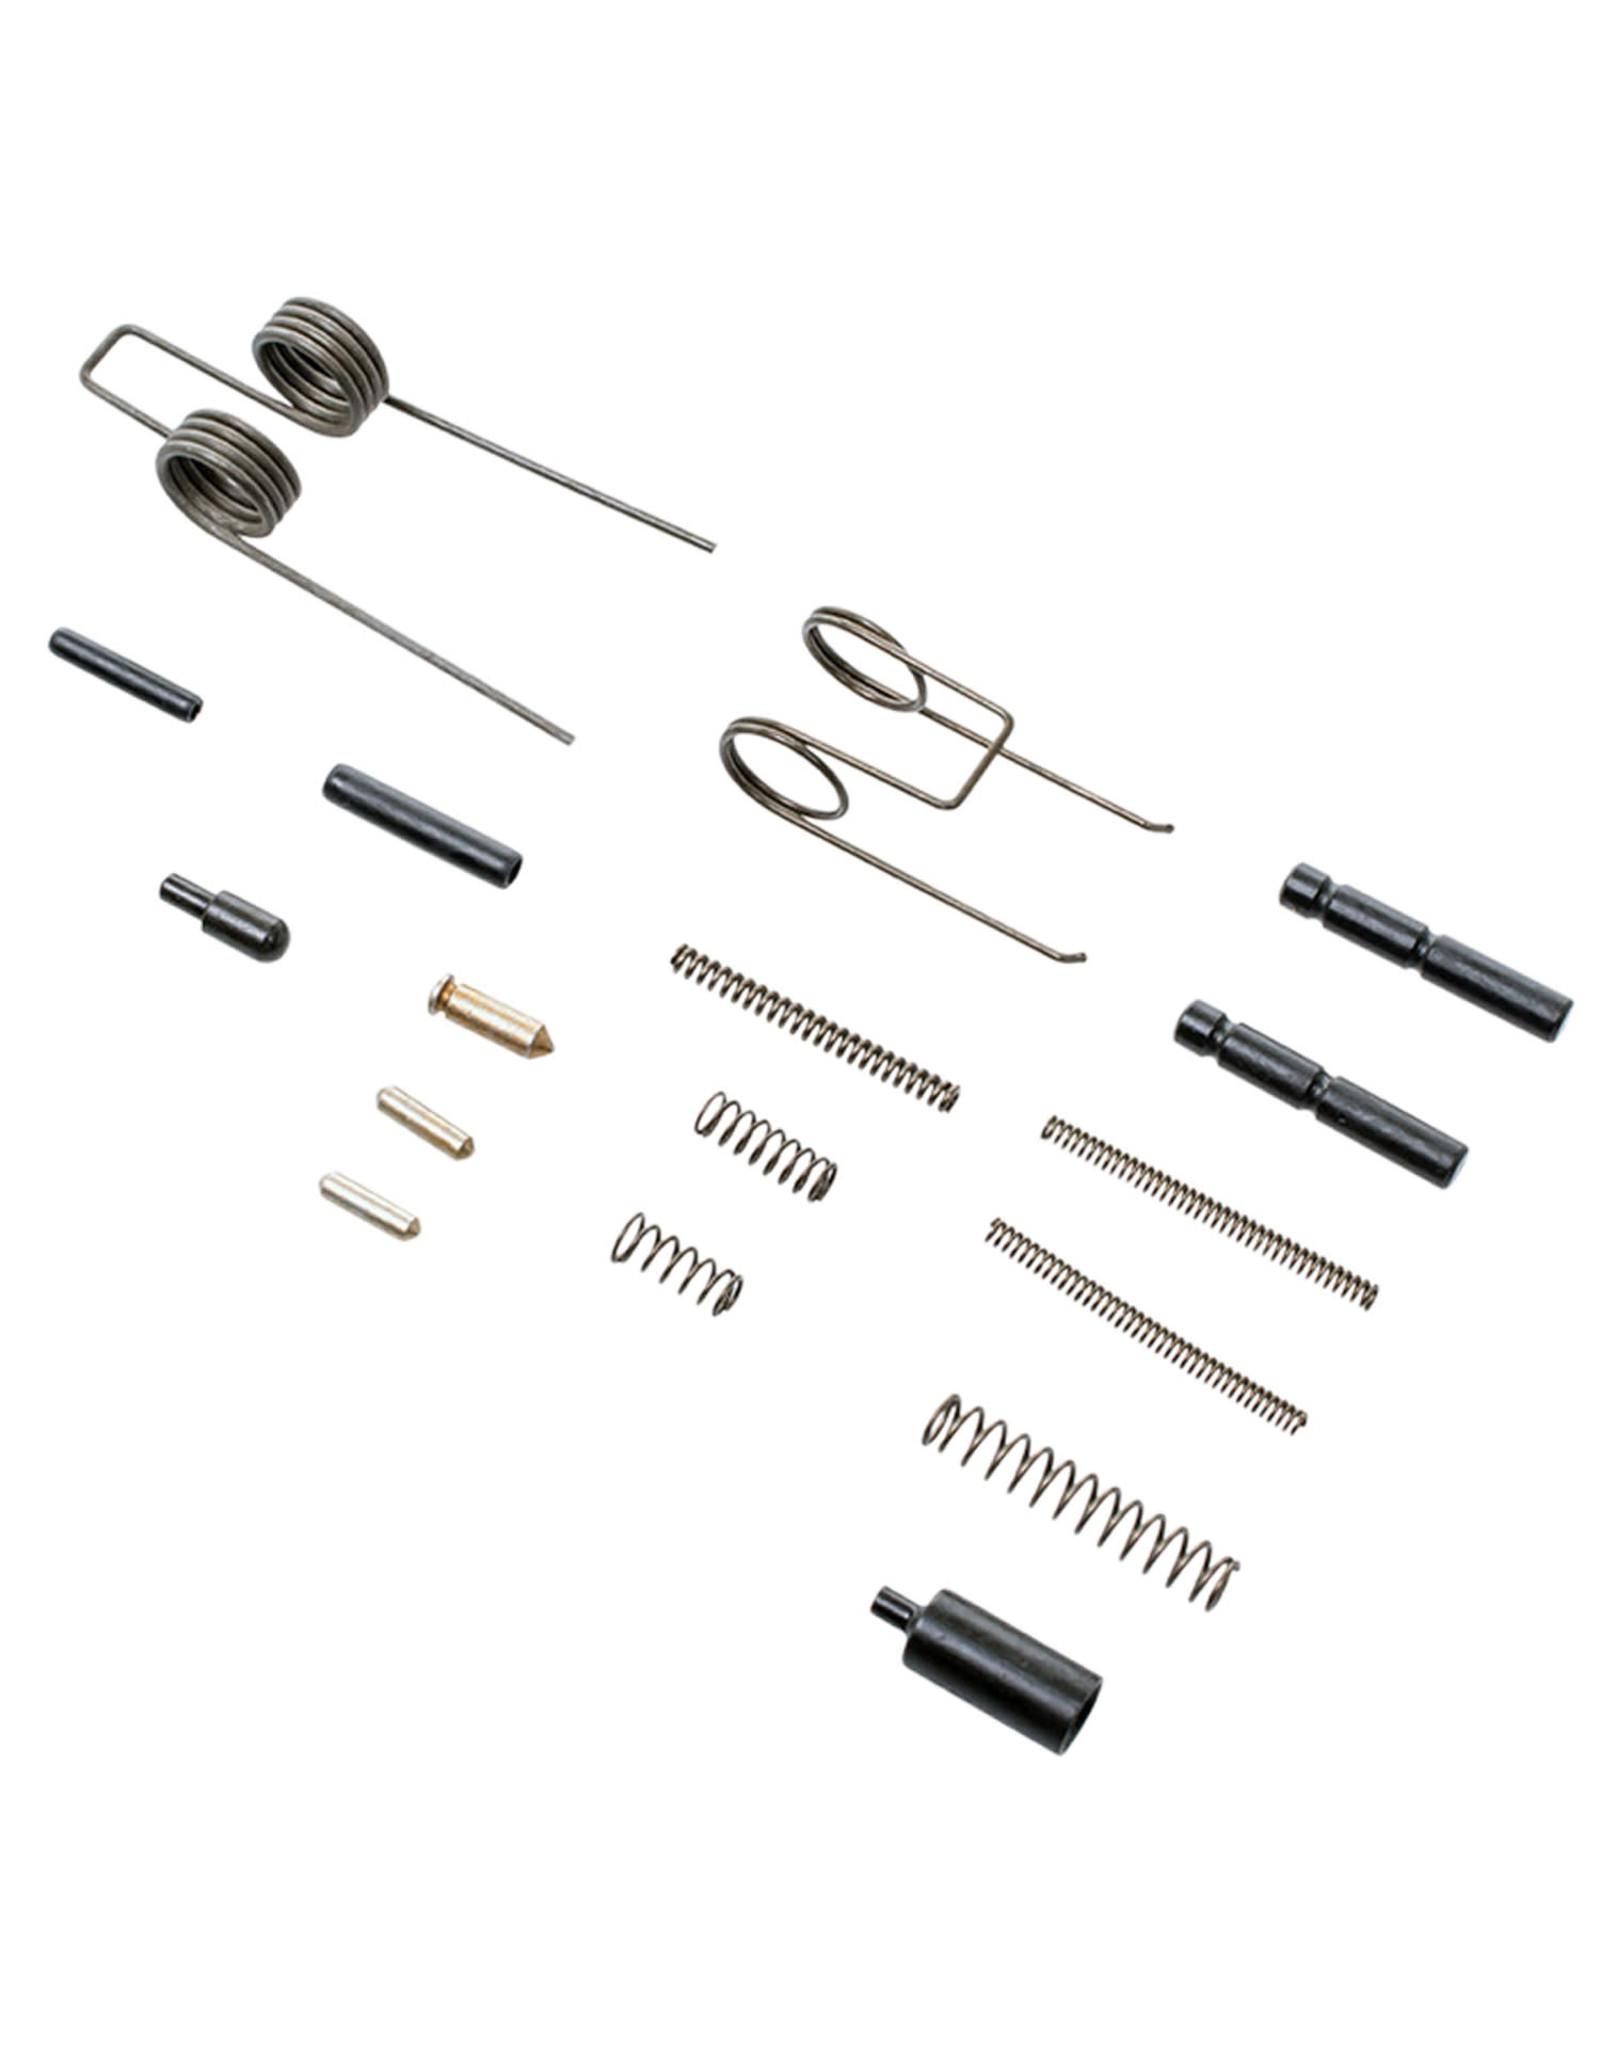 CMMG CMMG AR-15 Lower Parts Kit Pins & Springs